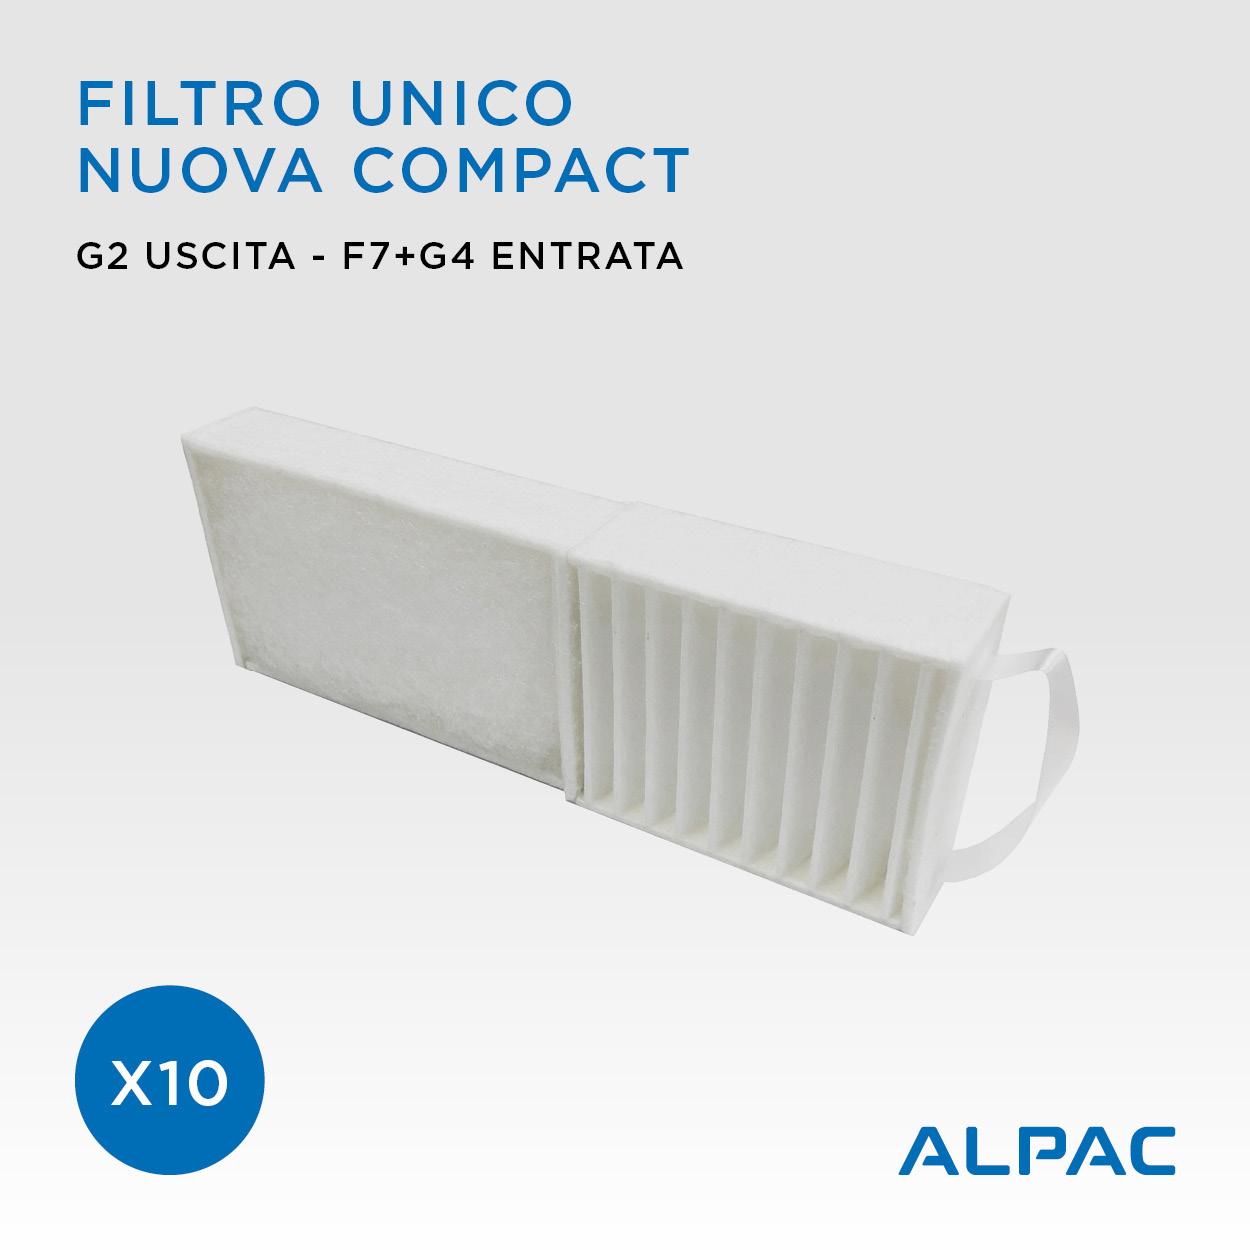 PROMO x10 Filtro unico Alpac Nuova Compact / Climapac Aliante, Arias / Helty Flow Easy, Plus, Elite, Flow40